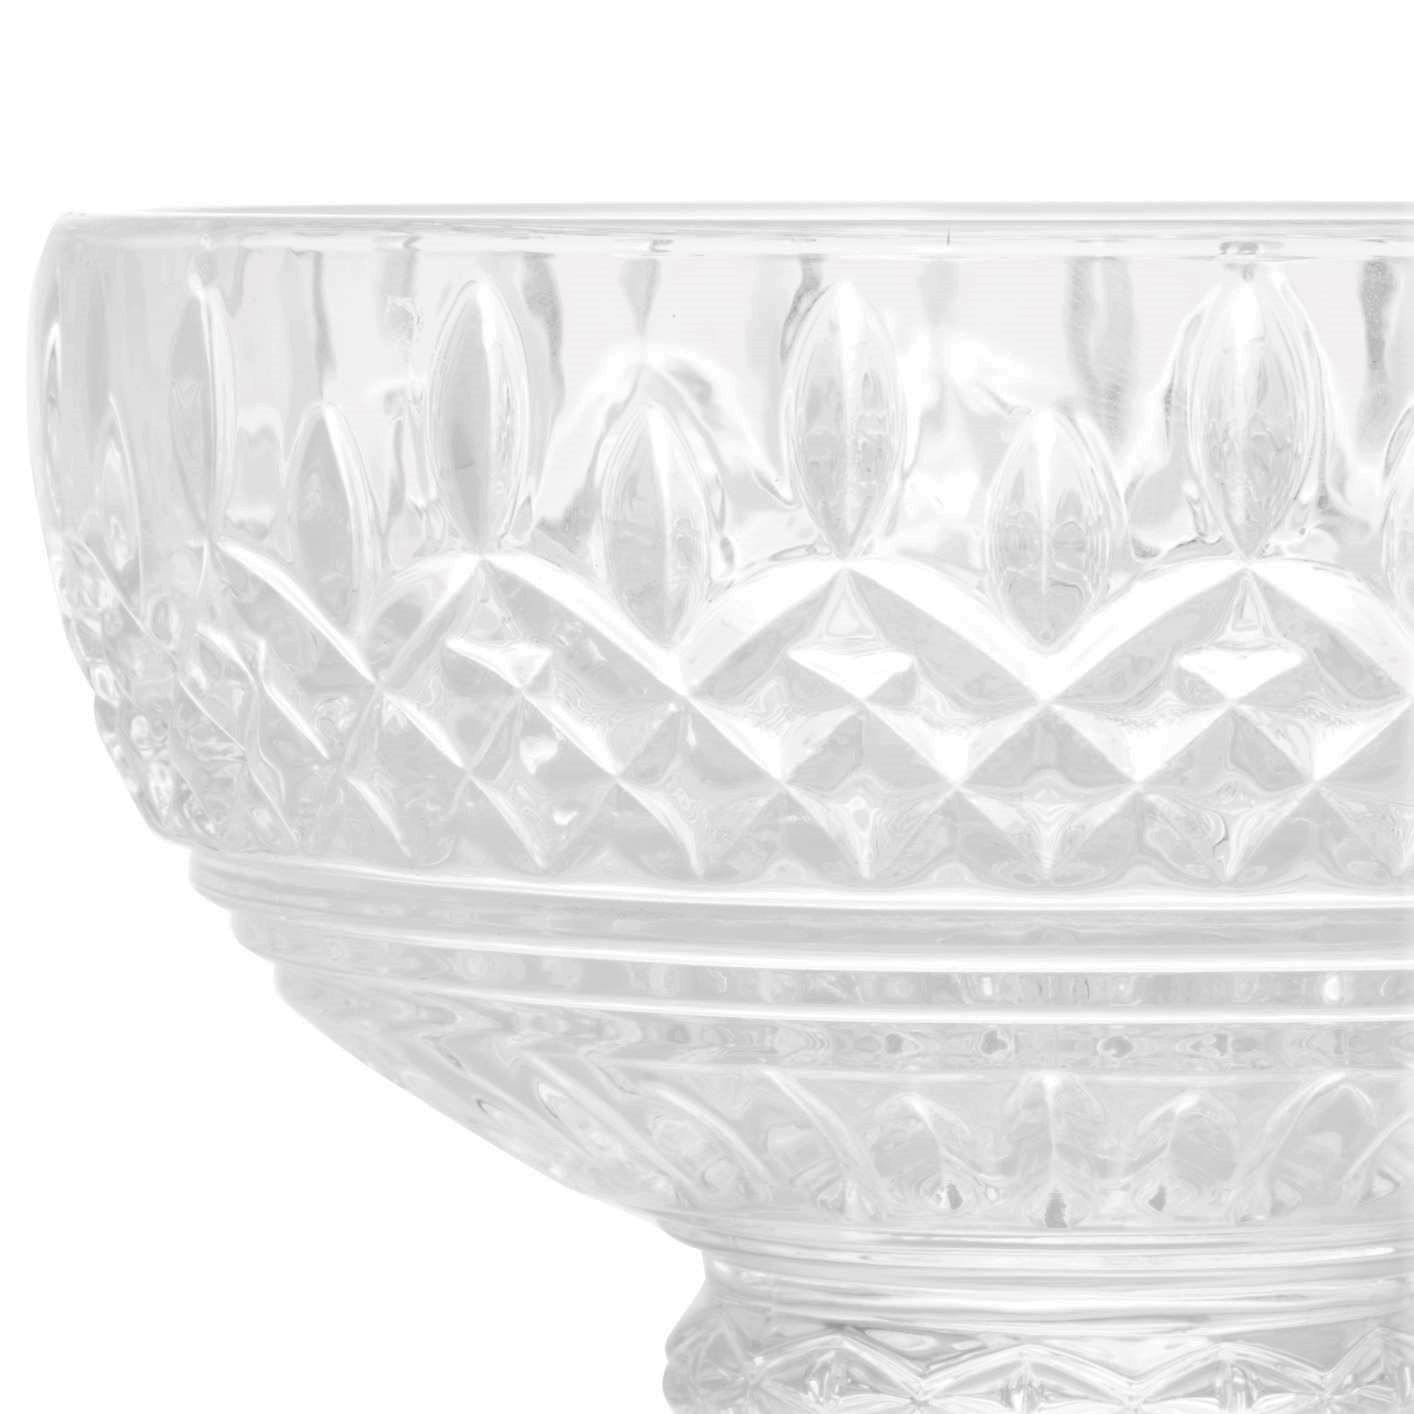 Taça de Sorvete de Cristal Wolff Lys Transparente (6 Peças)